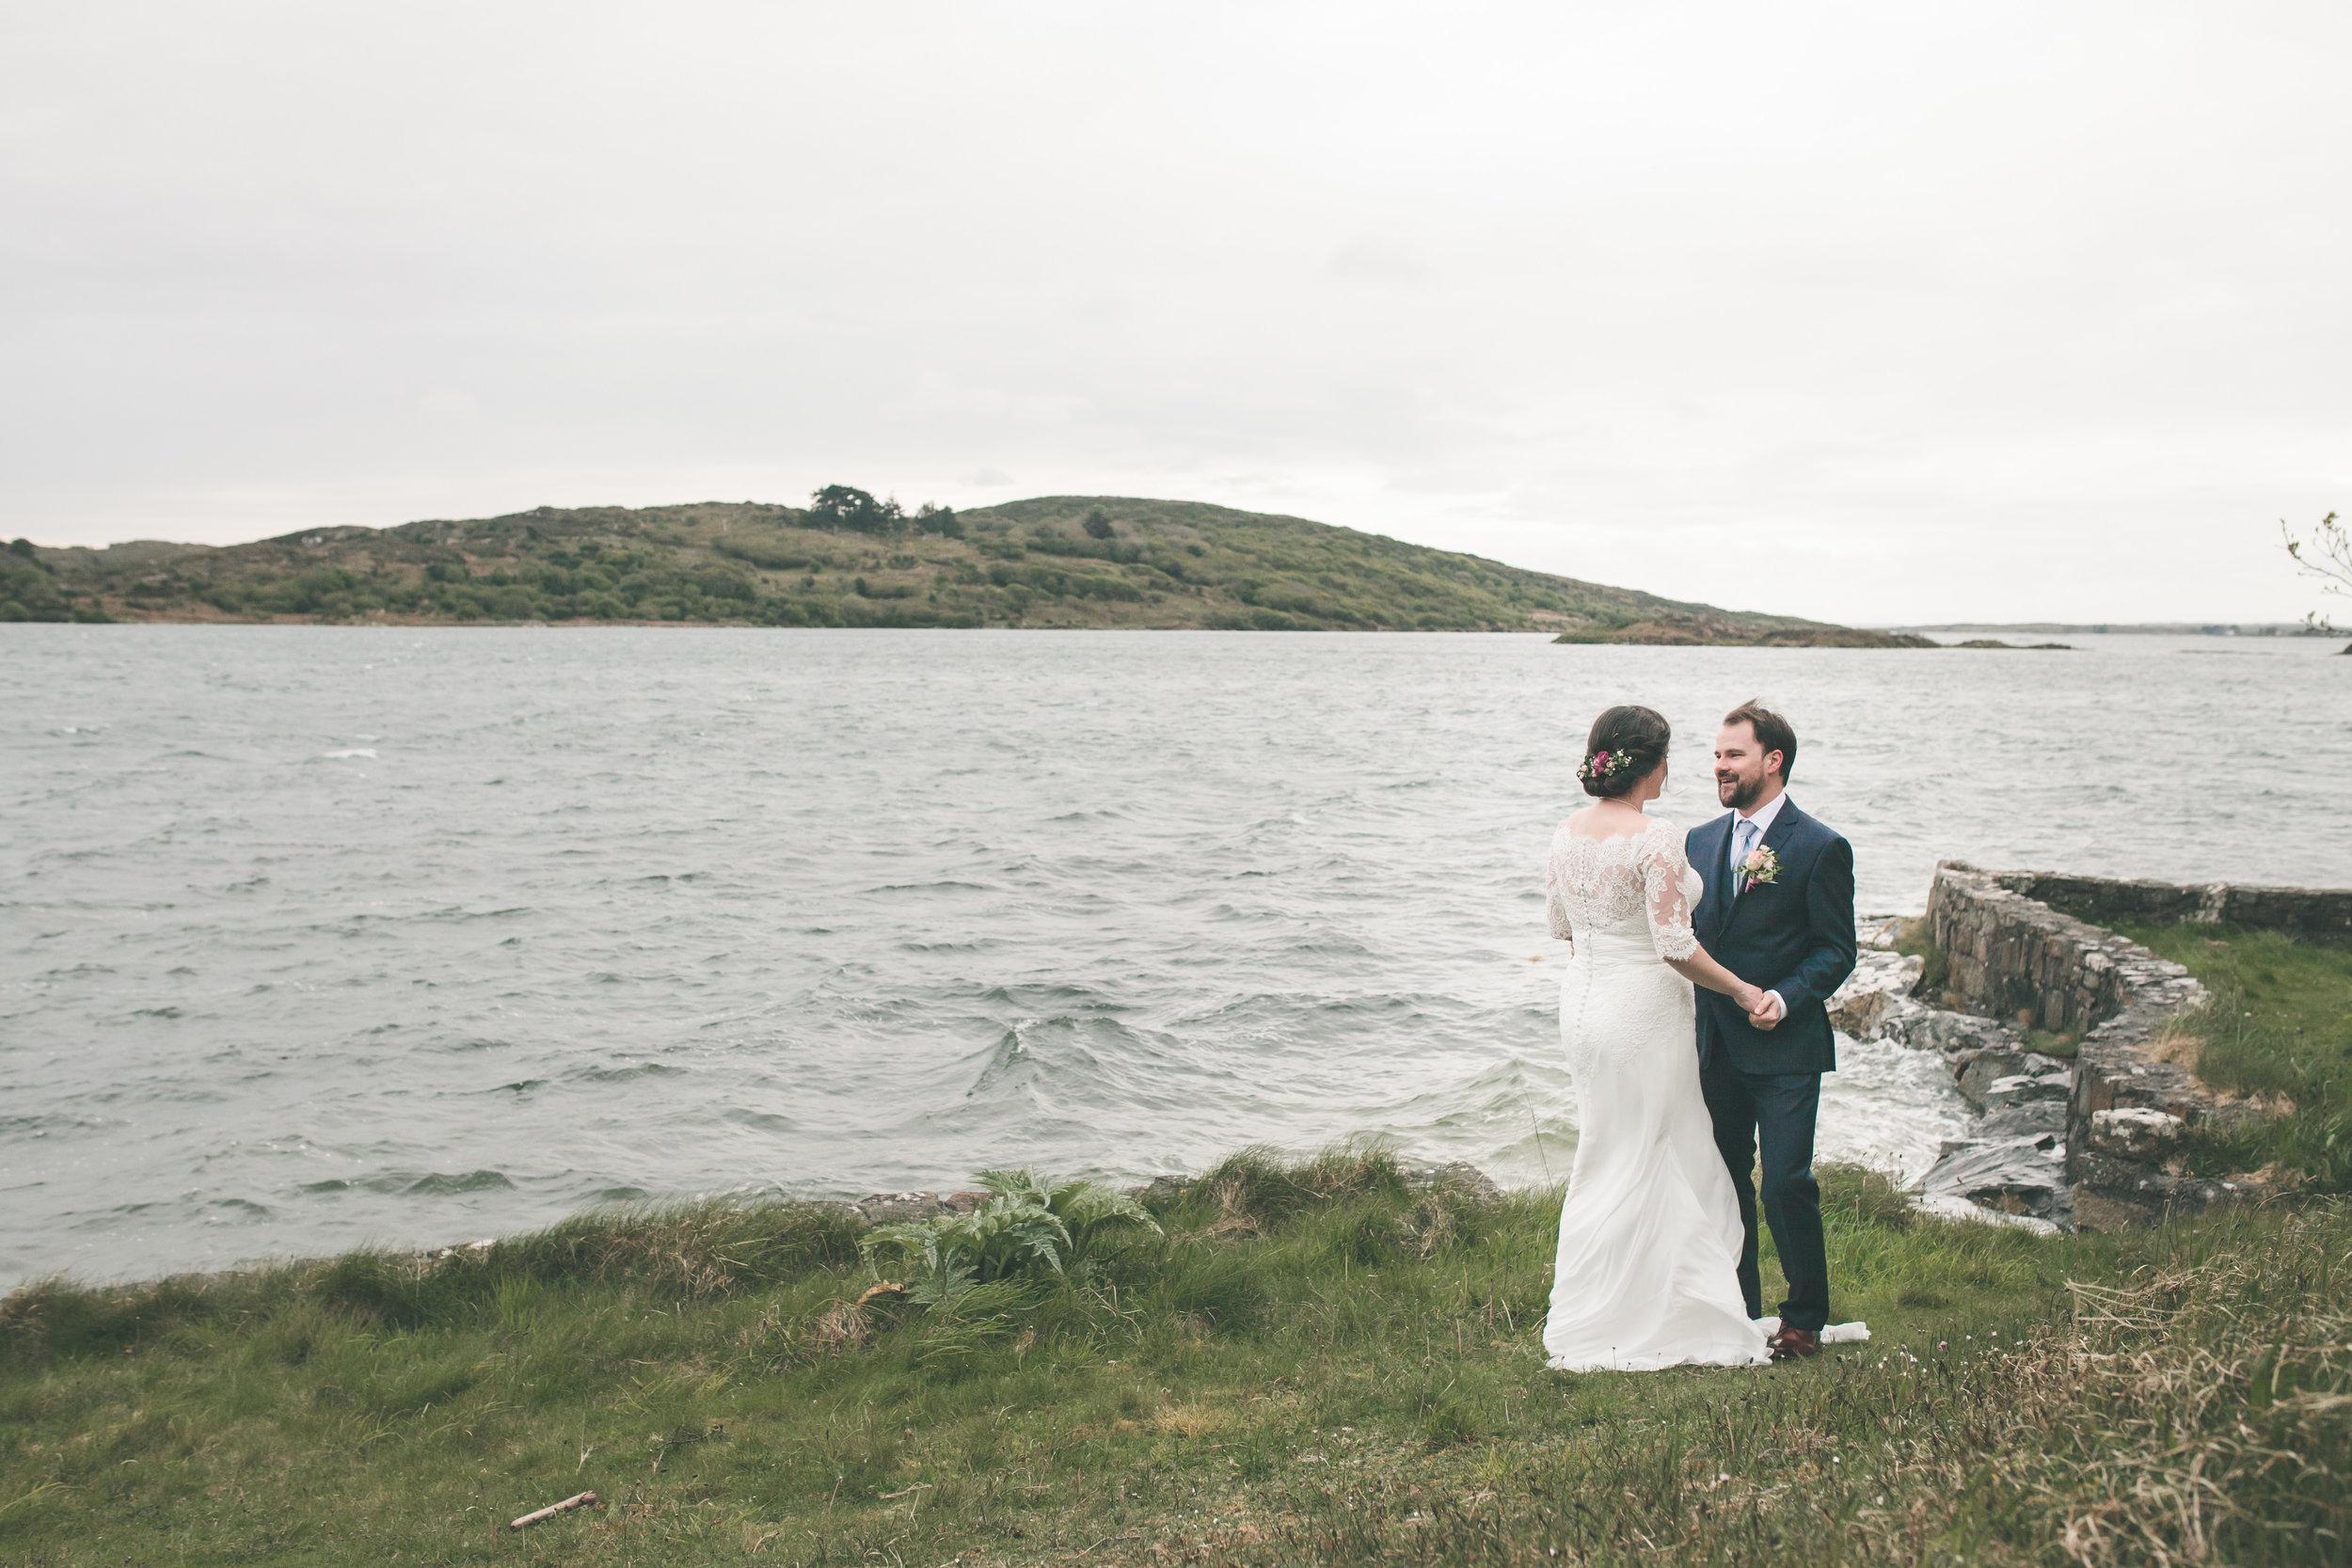 Anna_Mark_Cashel_Connemara_Olivia_Moon_Wedding_Photography-502.jpg